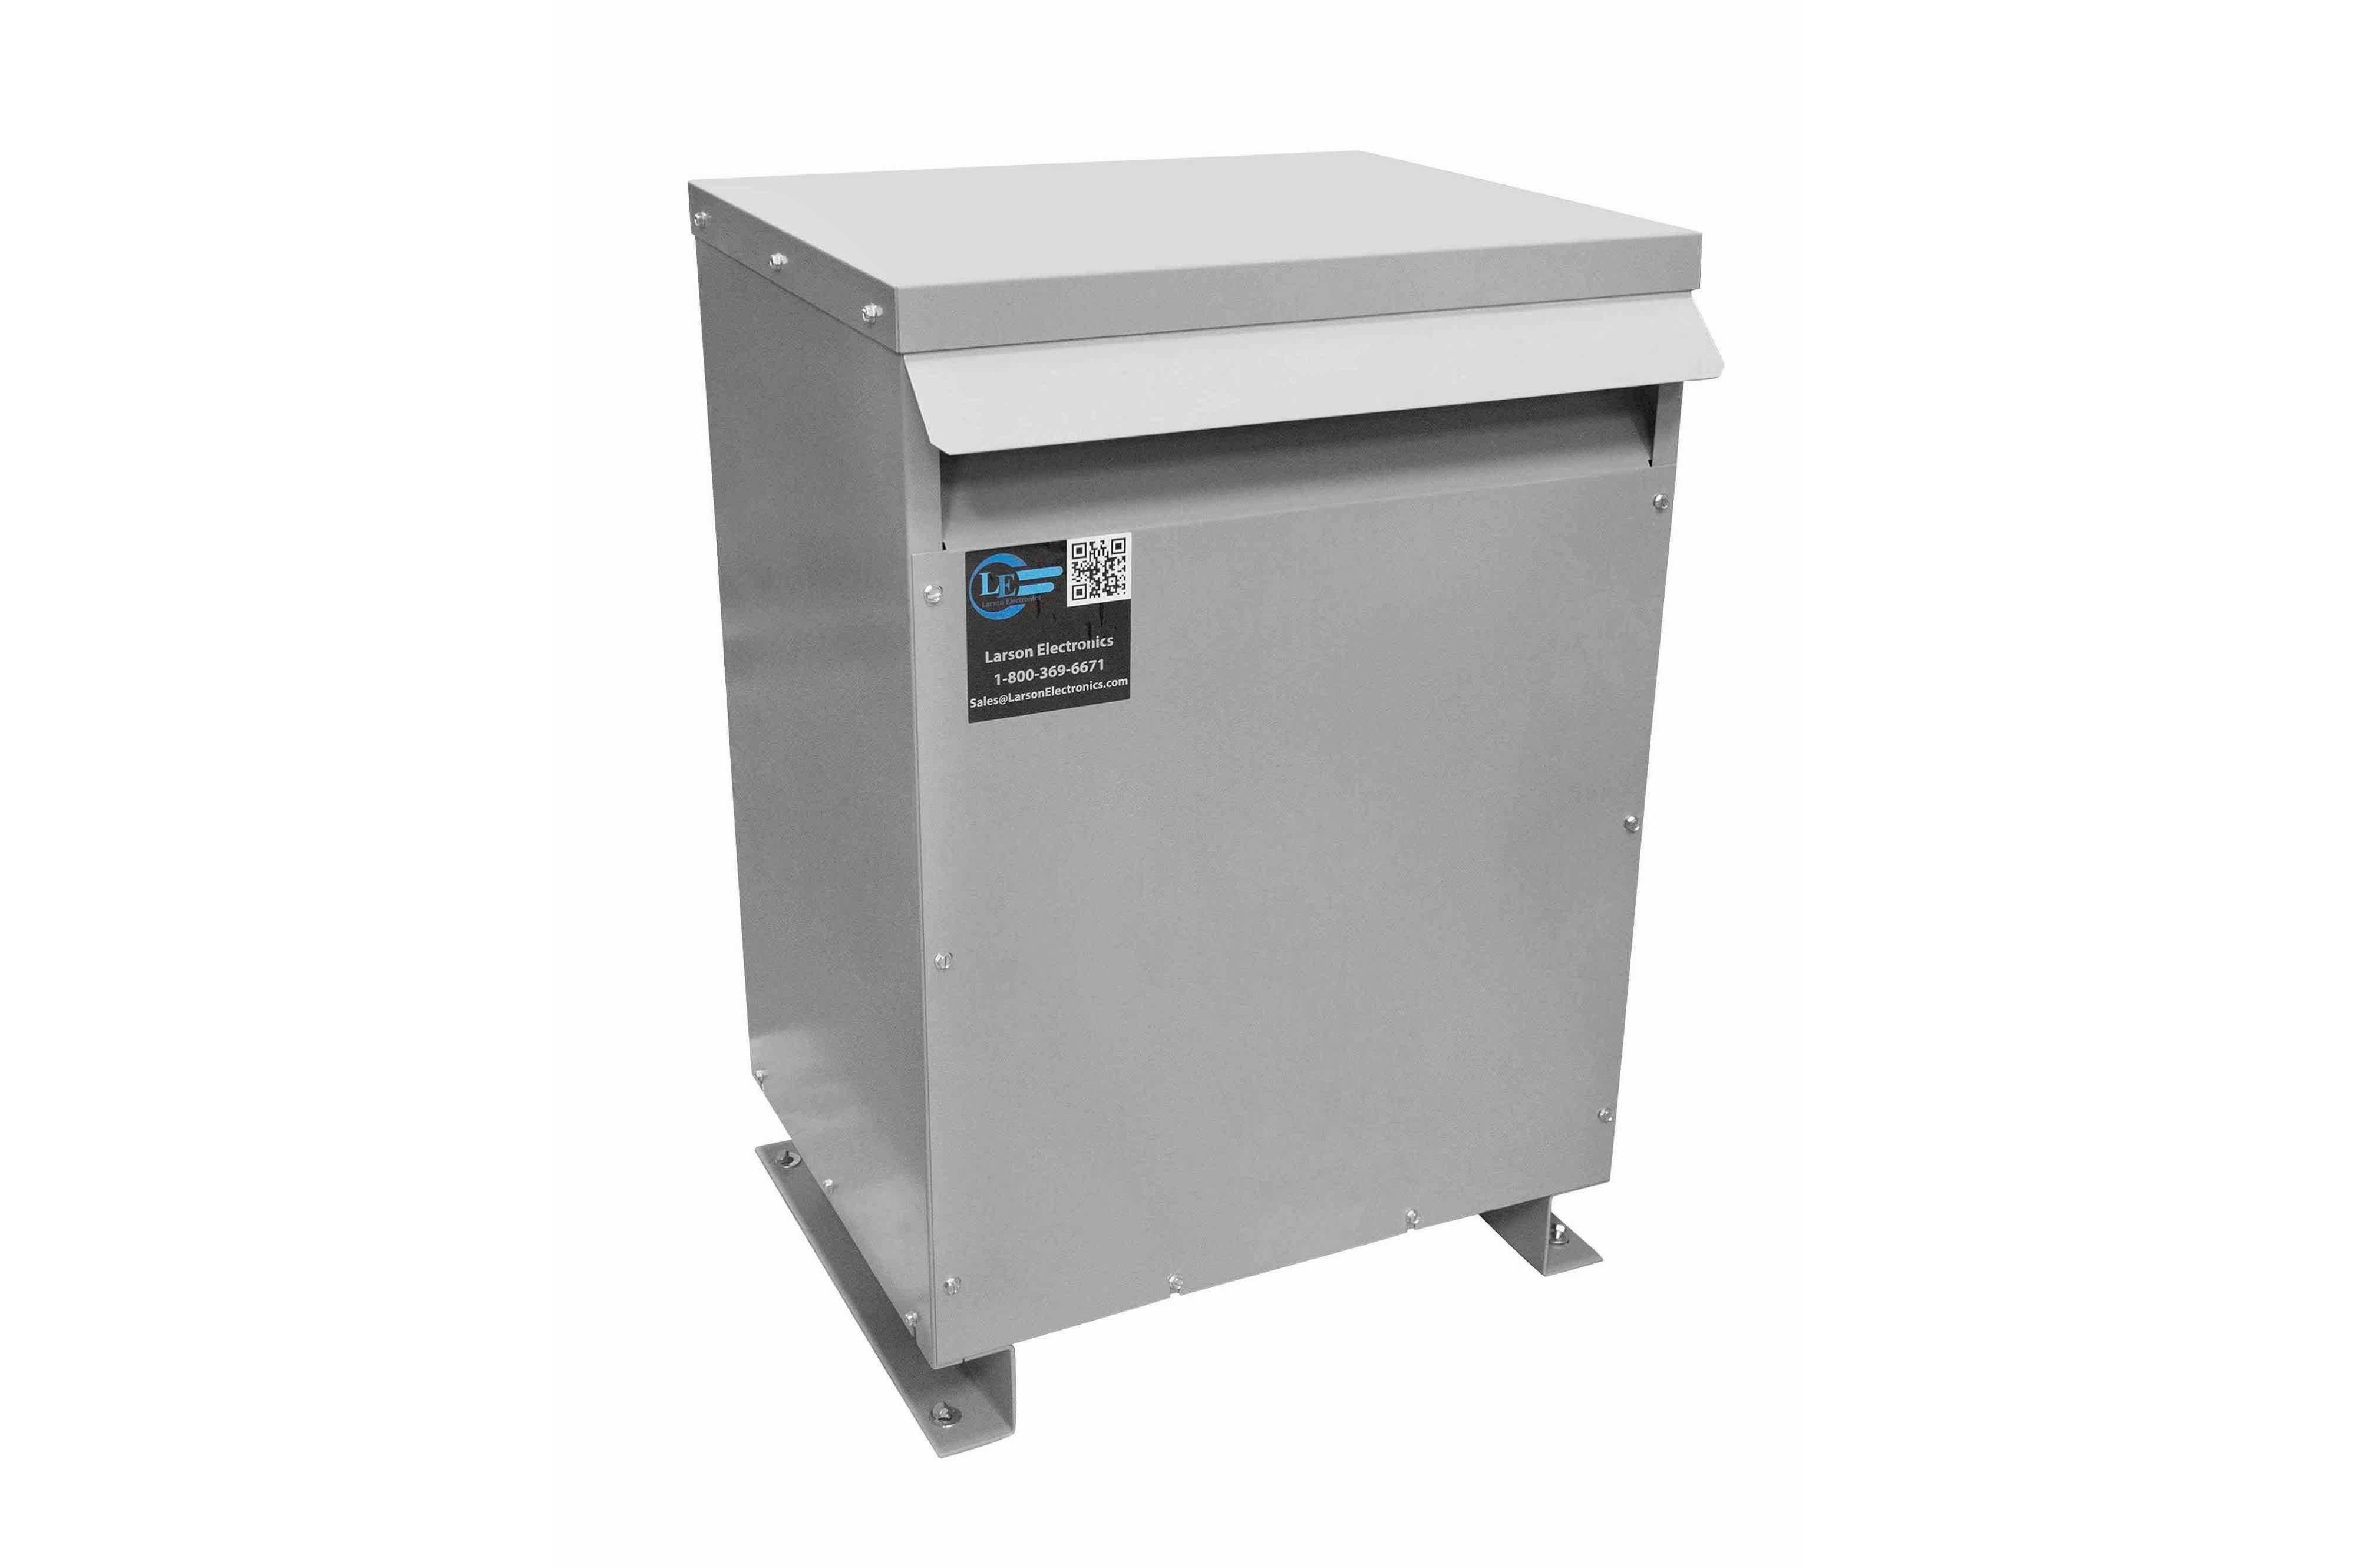 112.5 kVA 3PH Isolation Transformer, 240V Wye Primary, 380V Delta Secondary, N3R, Ventilated, 60 Hz